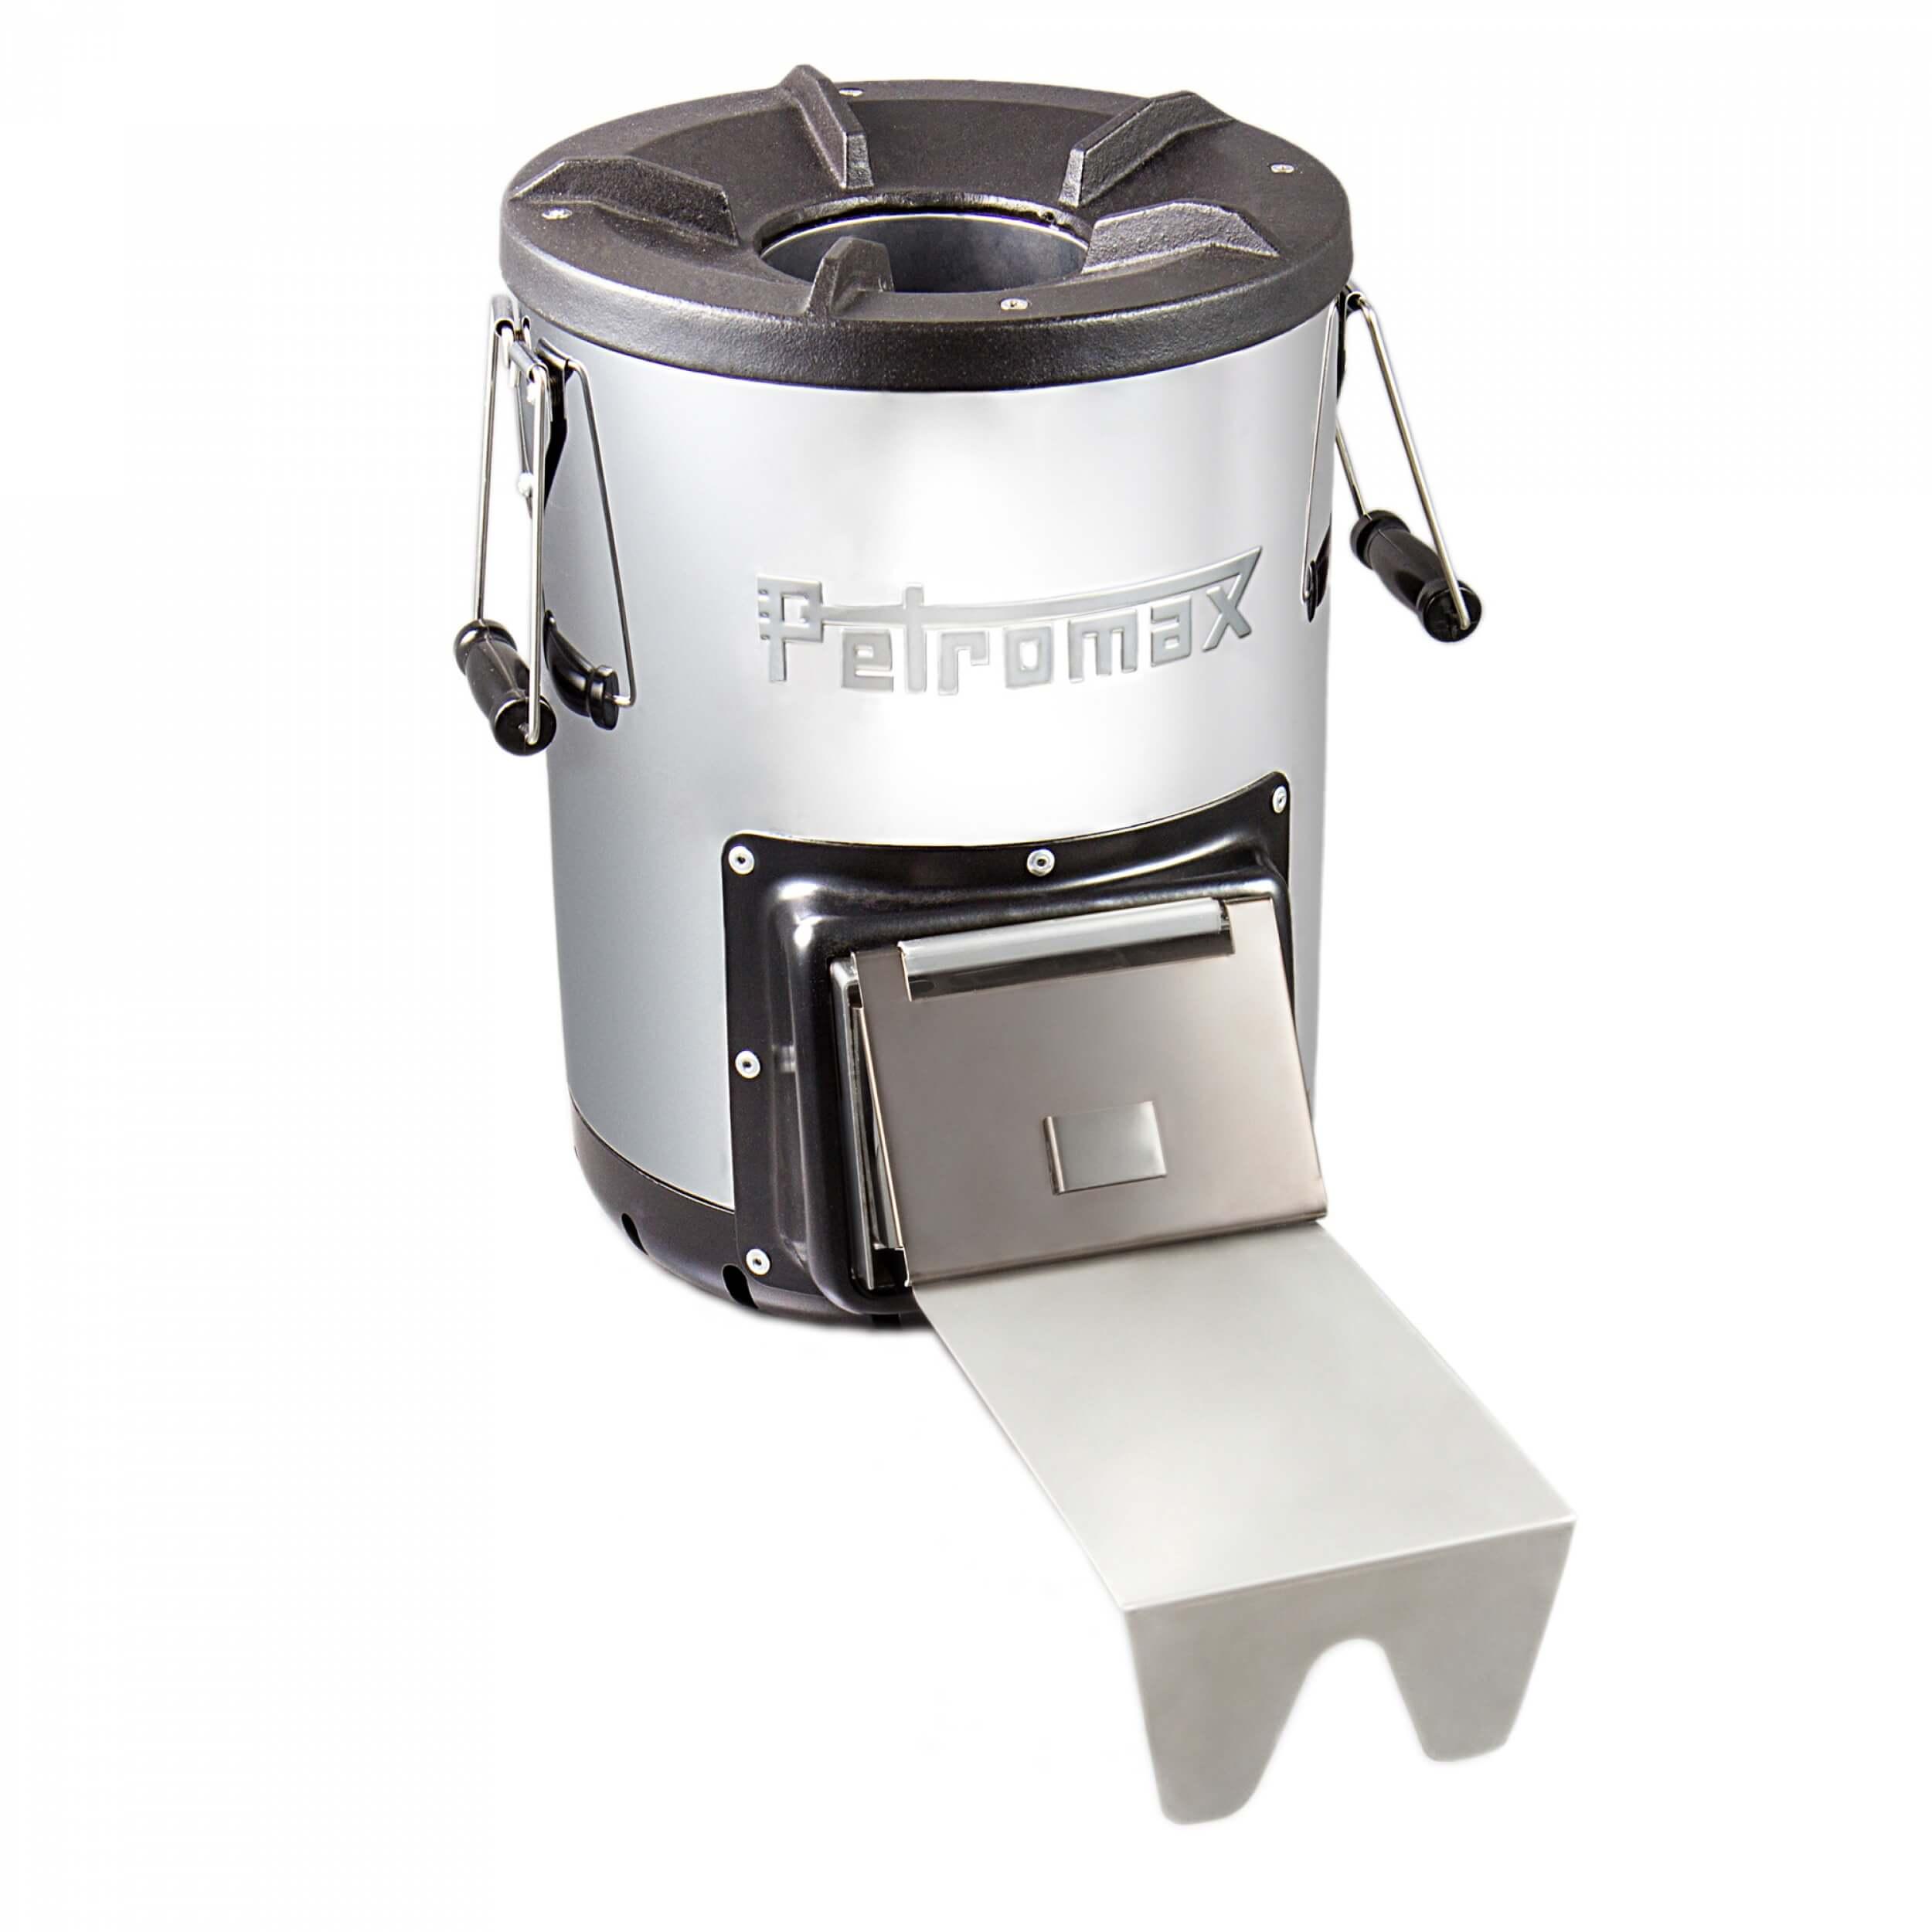 Petromax Raketenofen rf 33